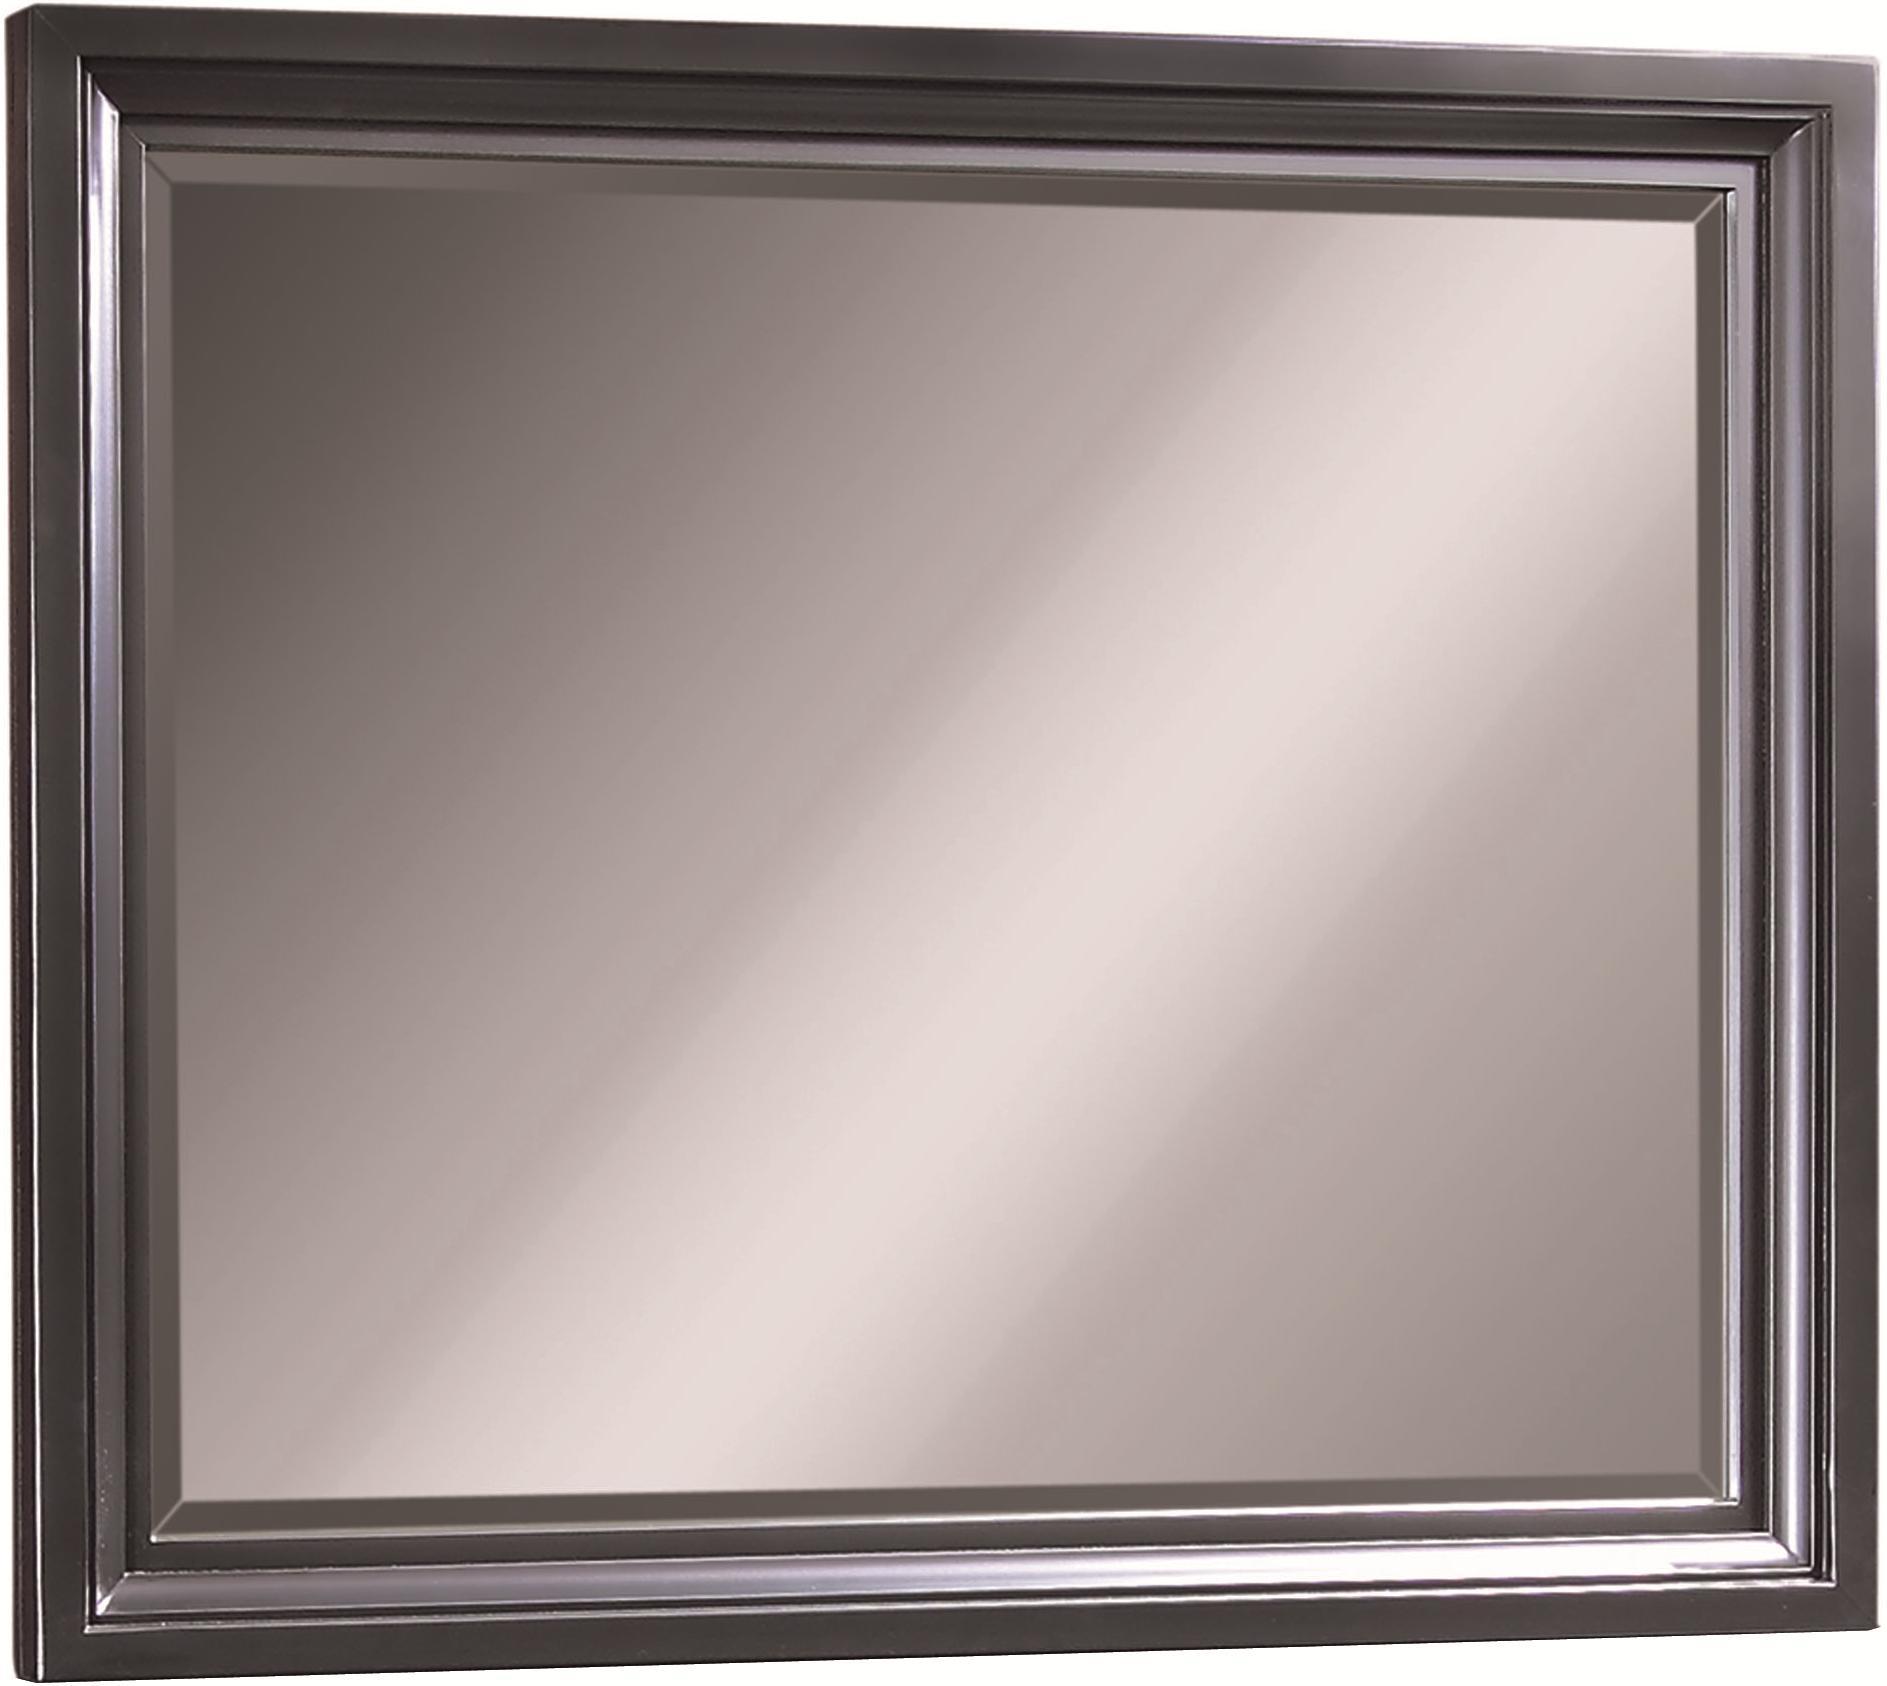 Cambridge Dresser Mirror by Aspenhome at Belfort Furniture